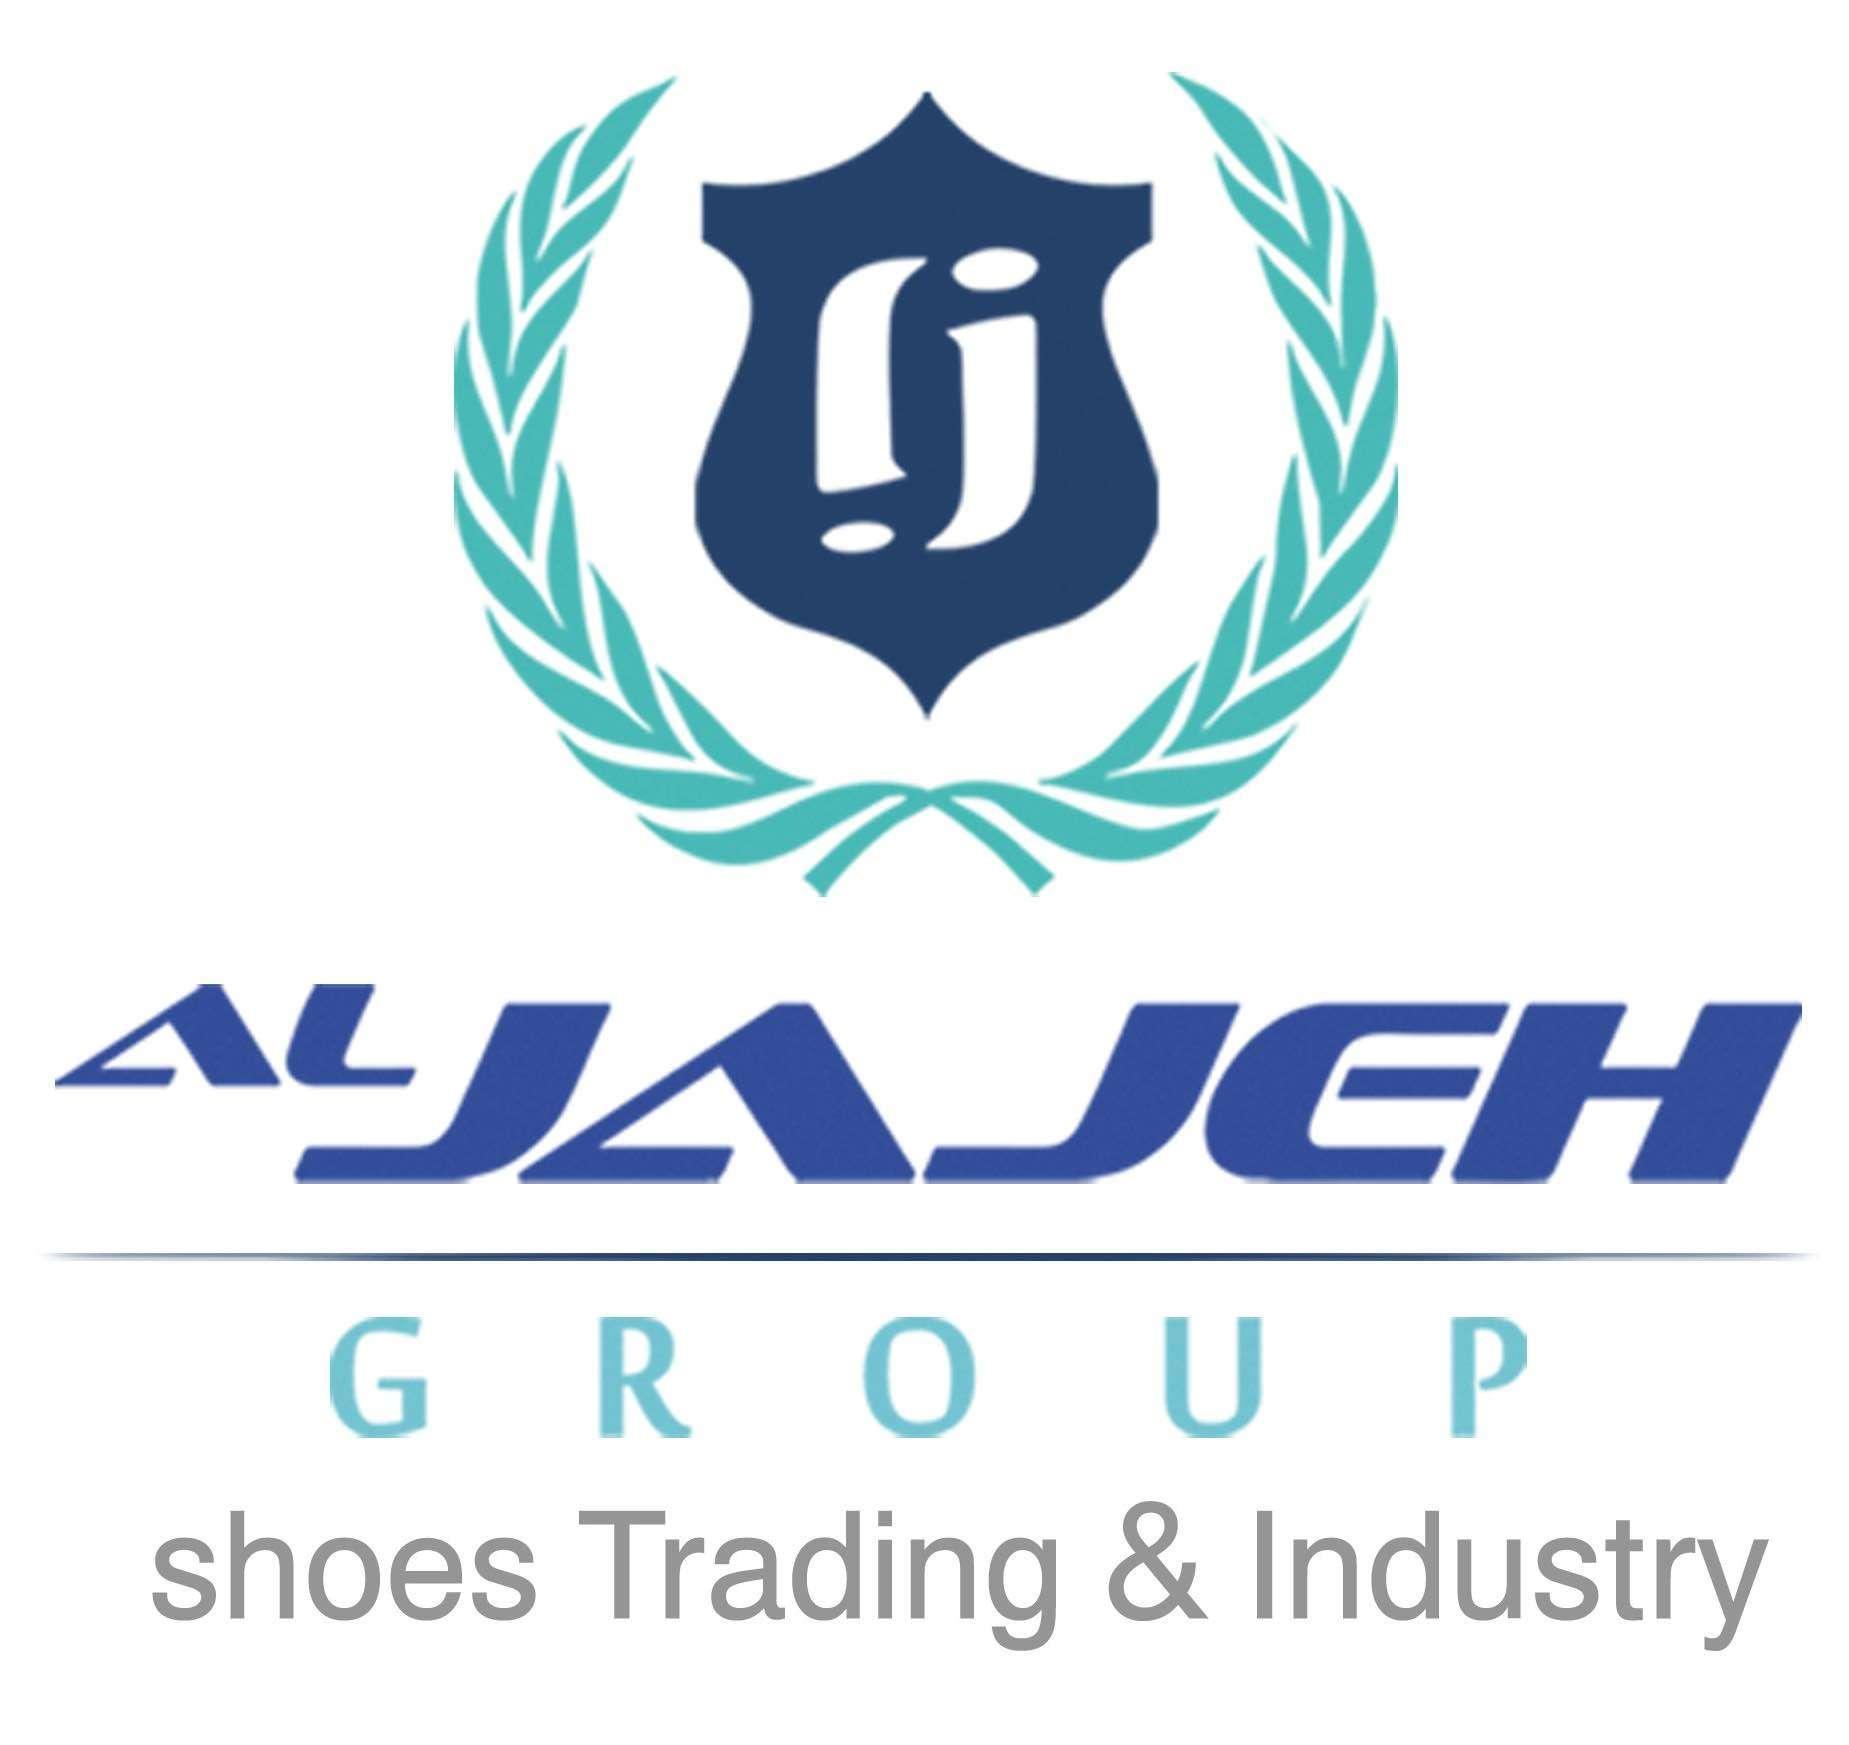 Aljajeh Group